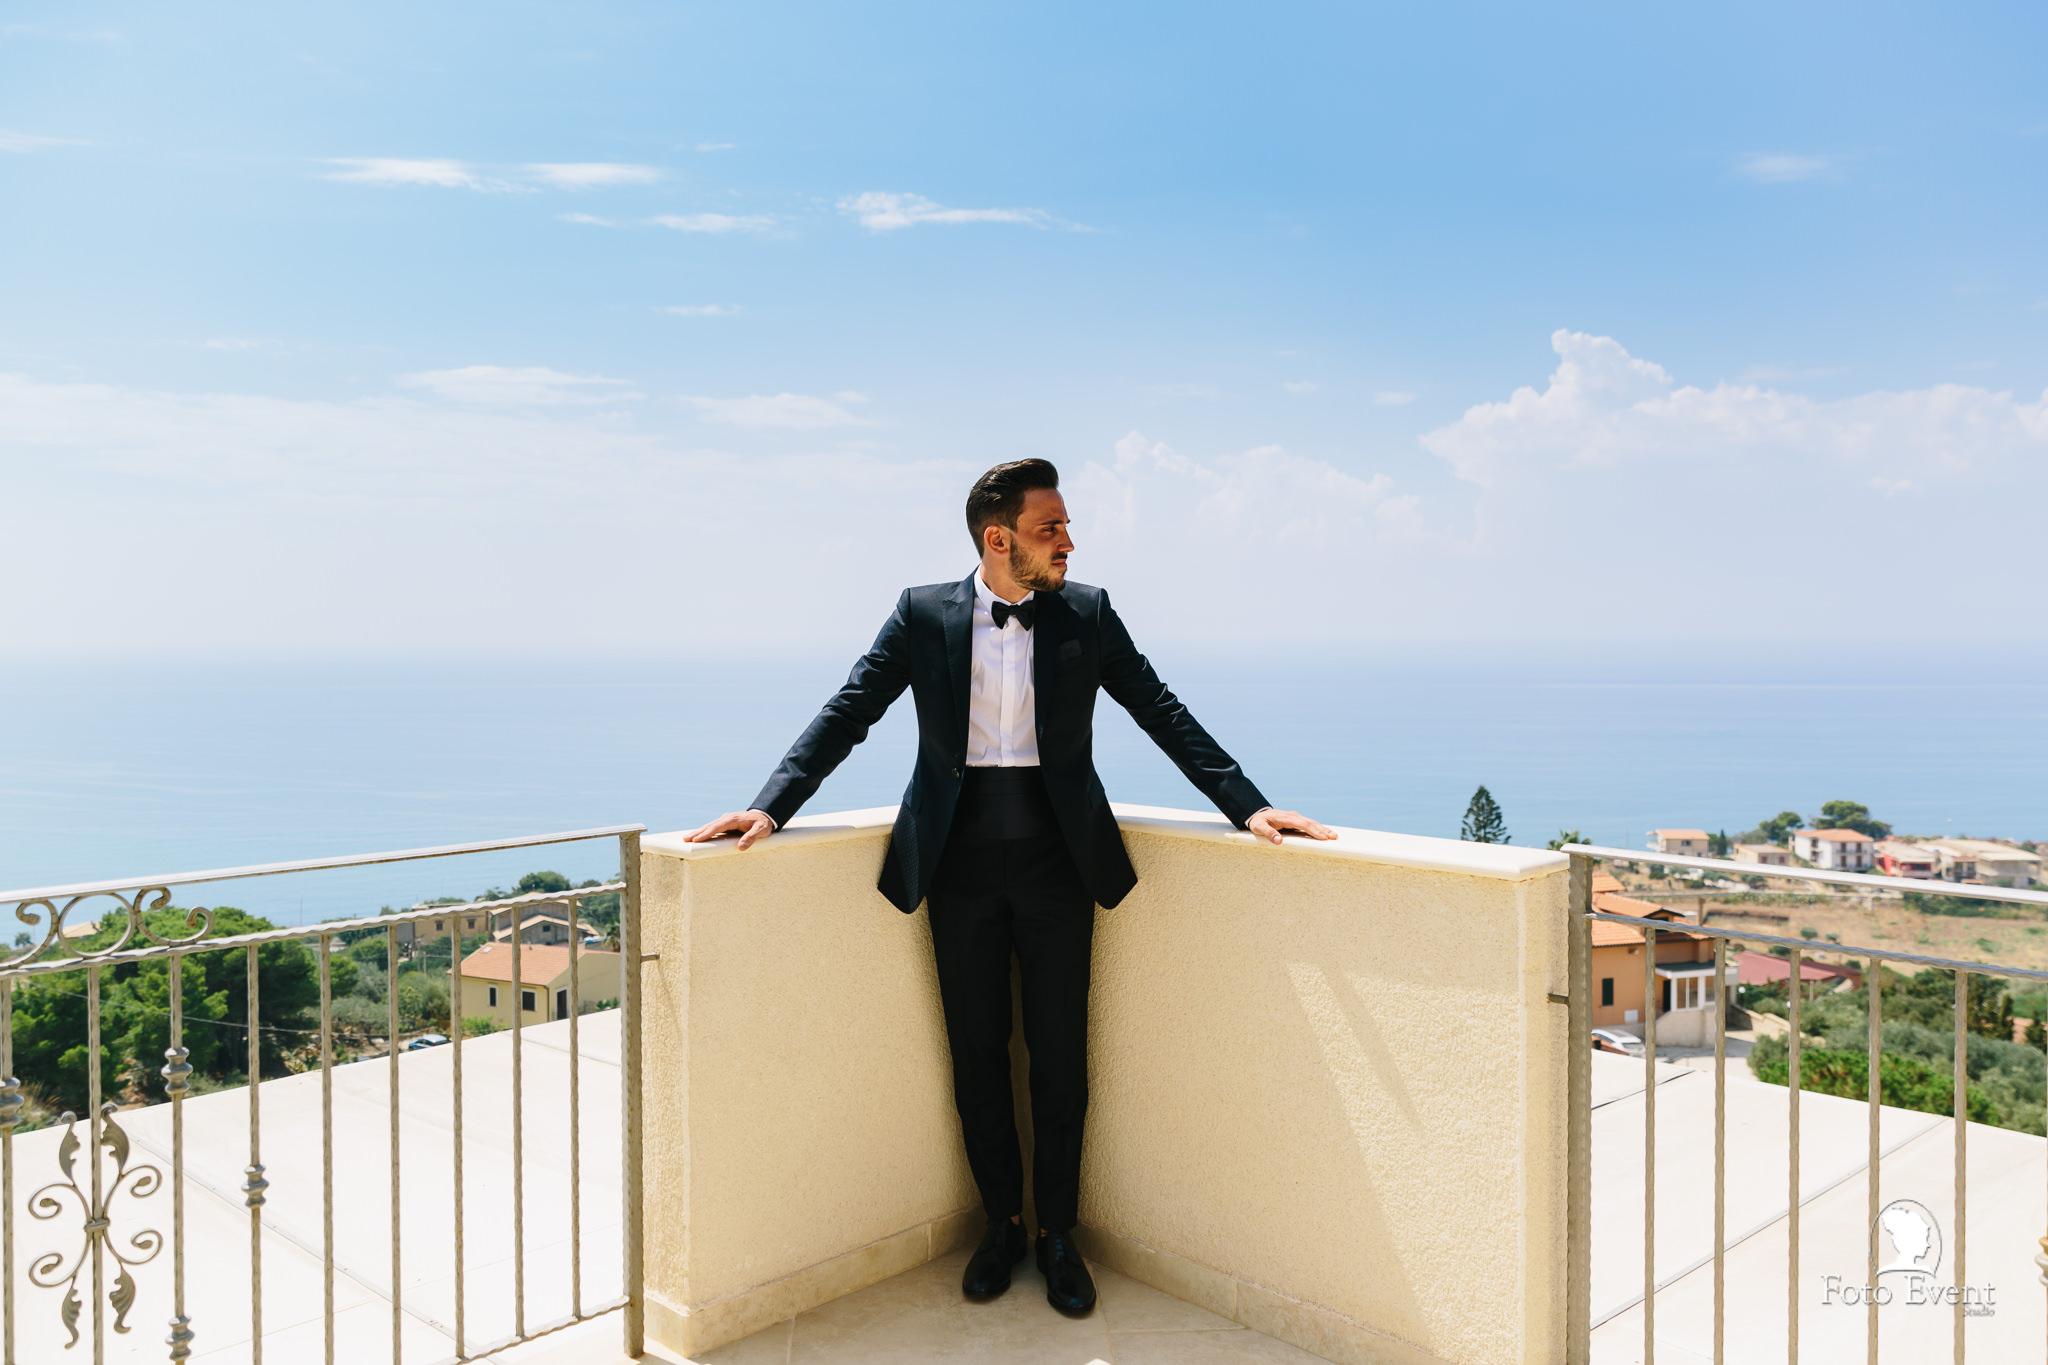 005-2019-08-31-Matrimonio-Serena-e-Saverio-Tarantino-5DE-153-Edit